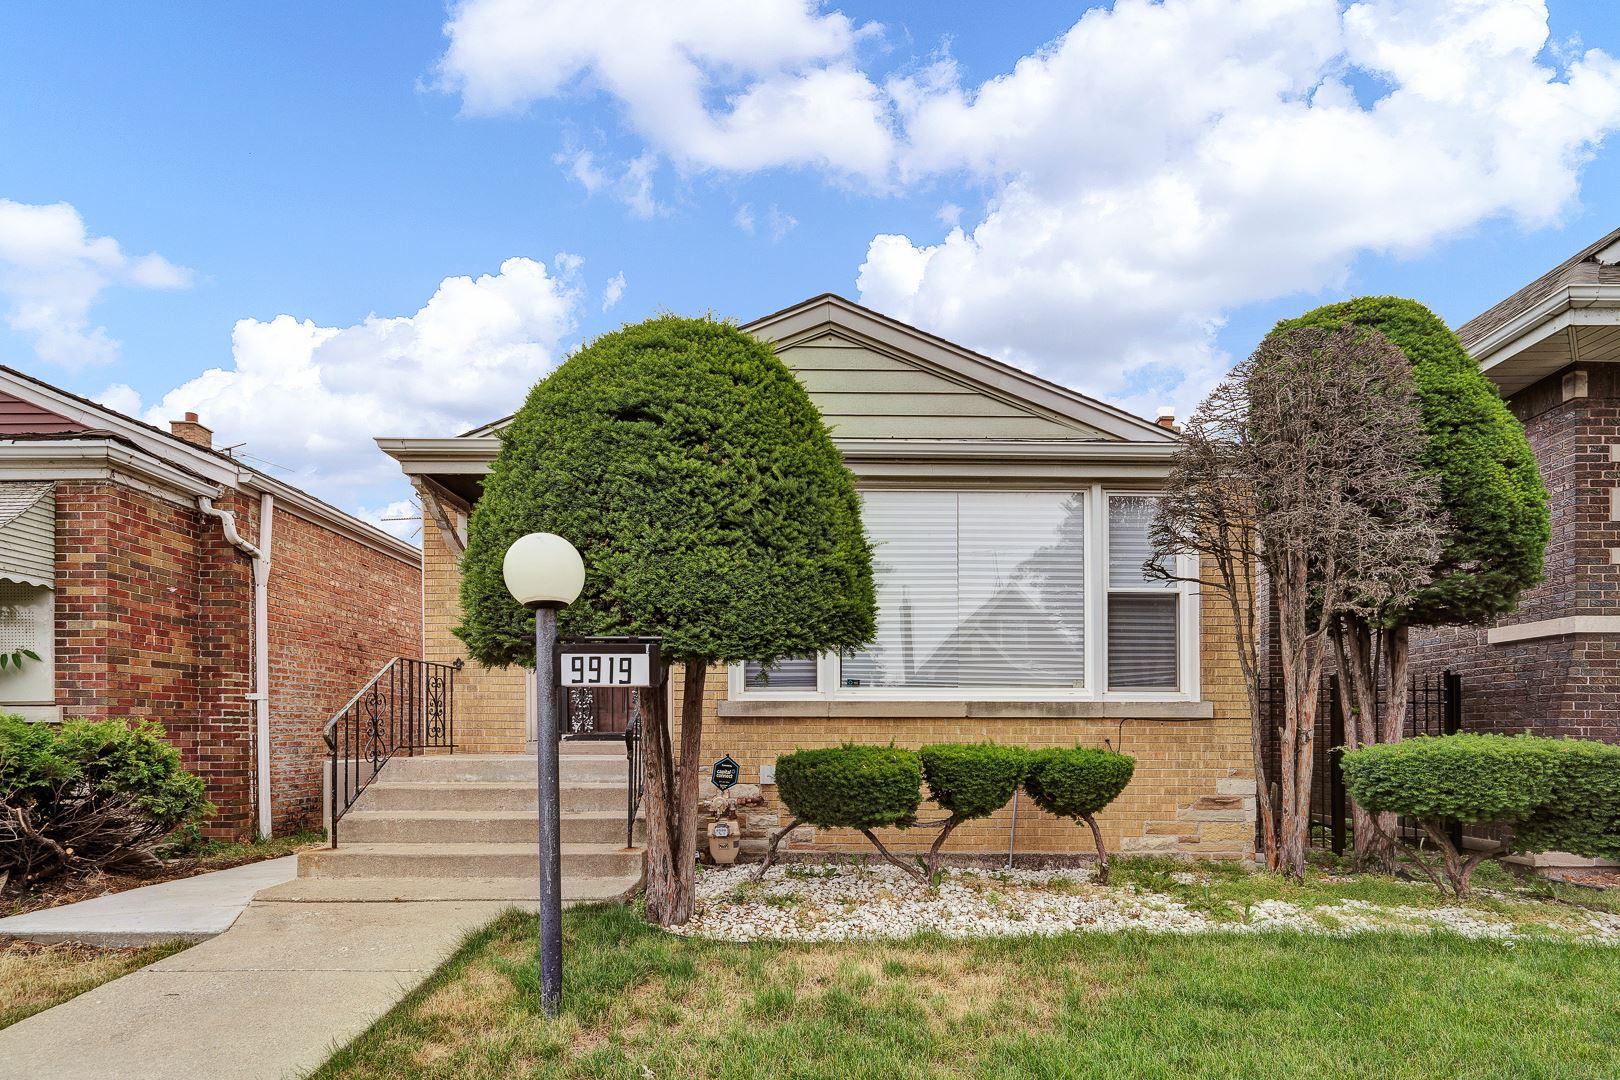 Photo for 9919 S Carpenter Street, Chicago, IL 60643 (MLS # 11218198)